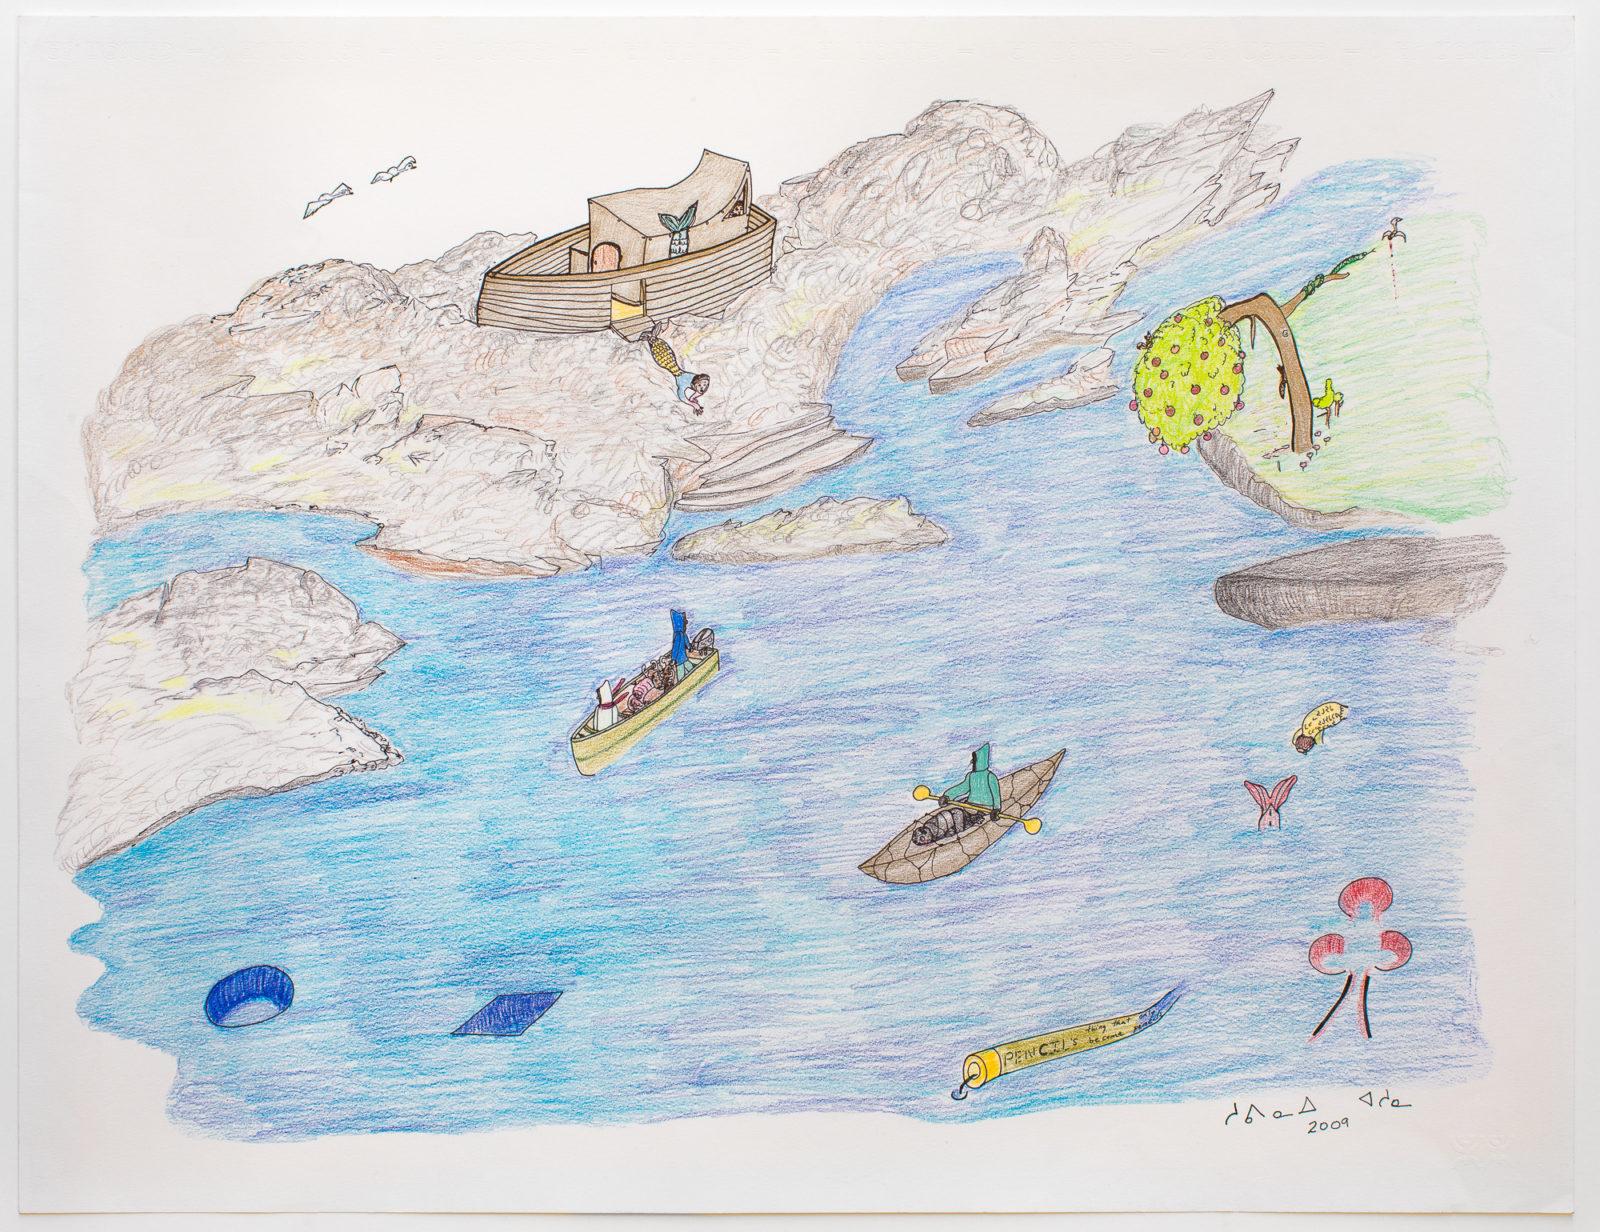 Shuvinai Ashoona - untitled (landscape with boats and tree)